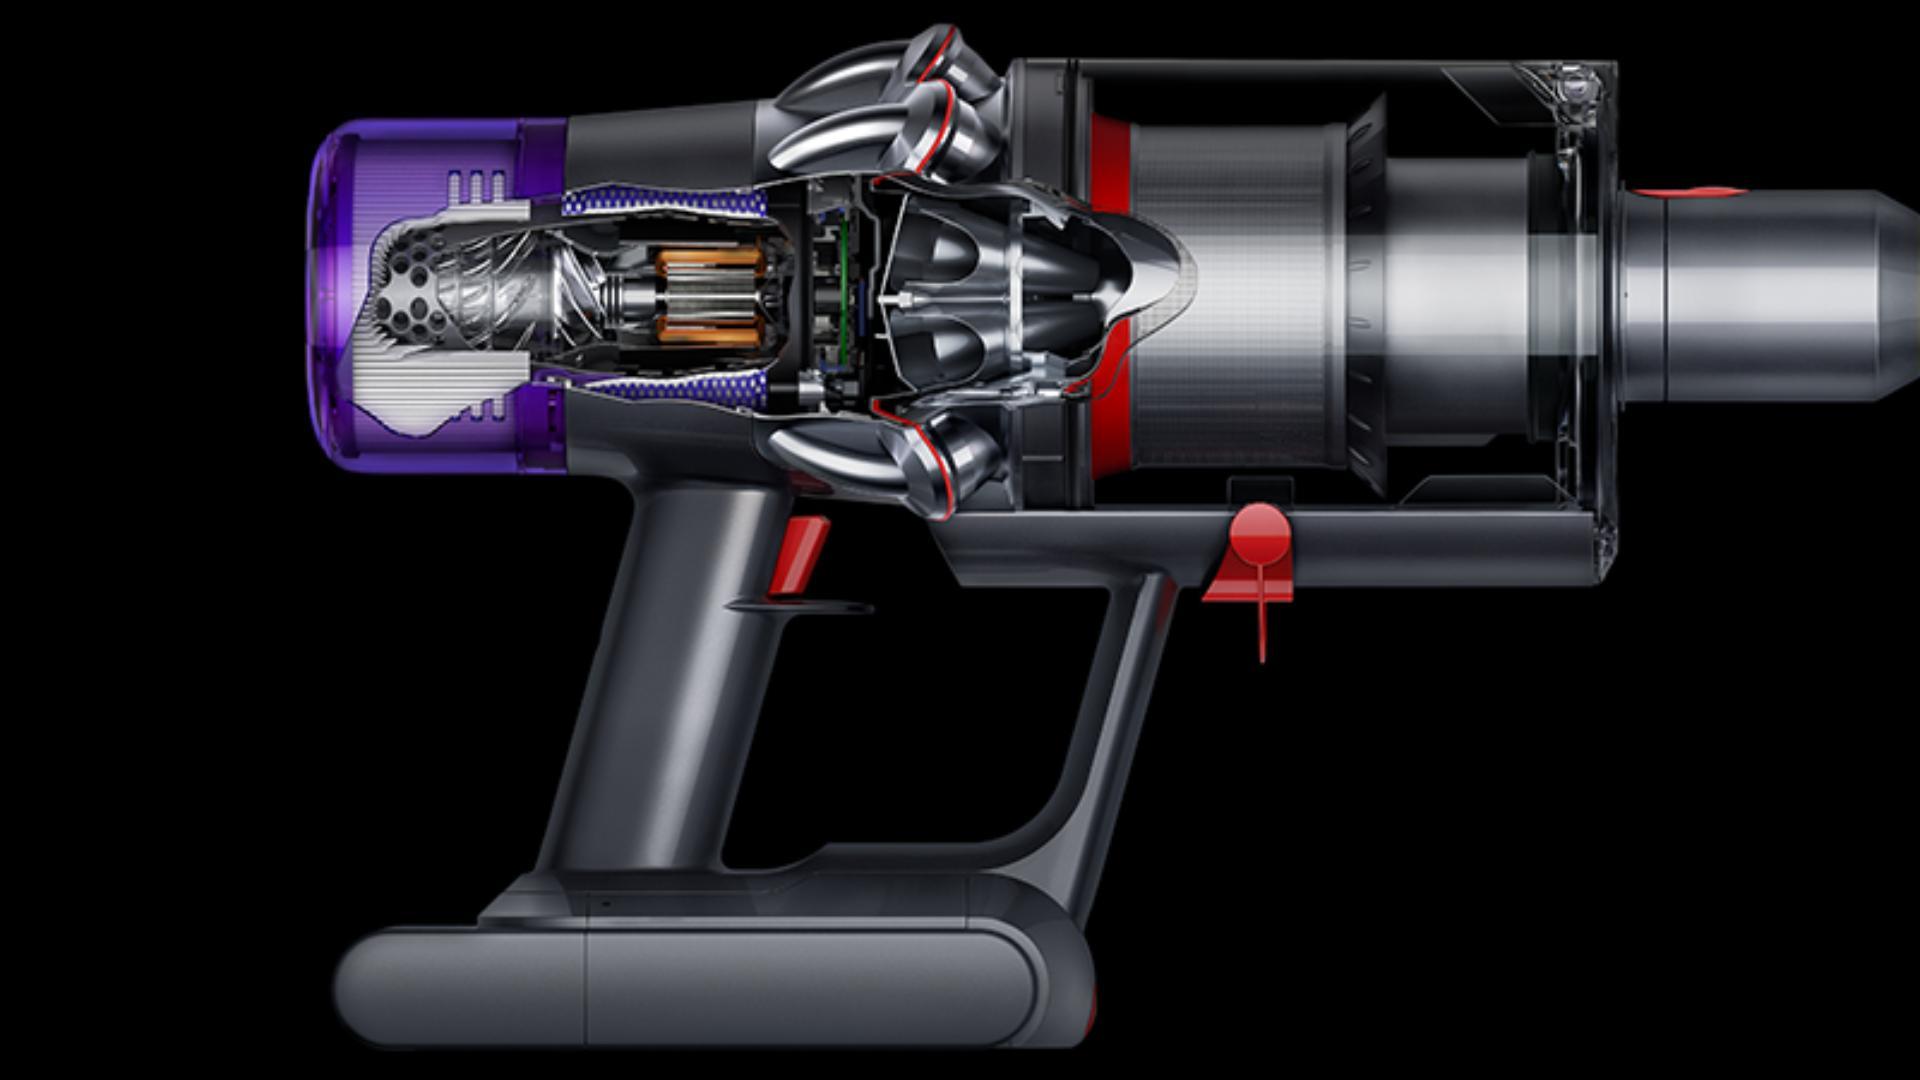 Cutaway of the Dyson V11™ vacuum's motor